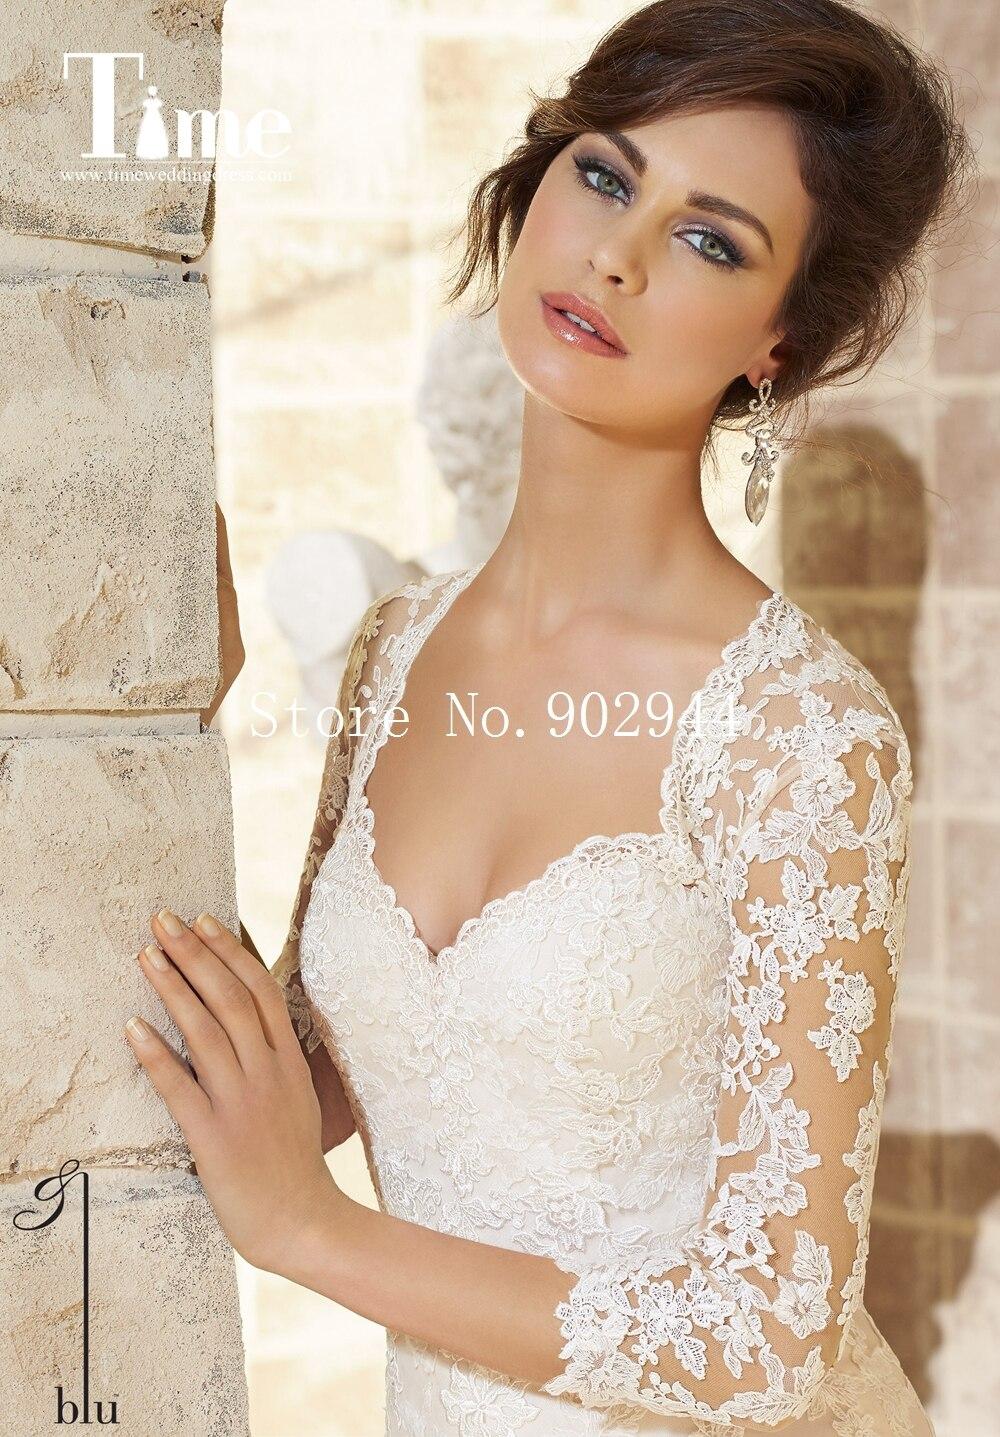 aire barcelona wedding dresses collection heart shaped wedding dress Aire Barcelona heart shaped back wedding dresses